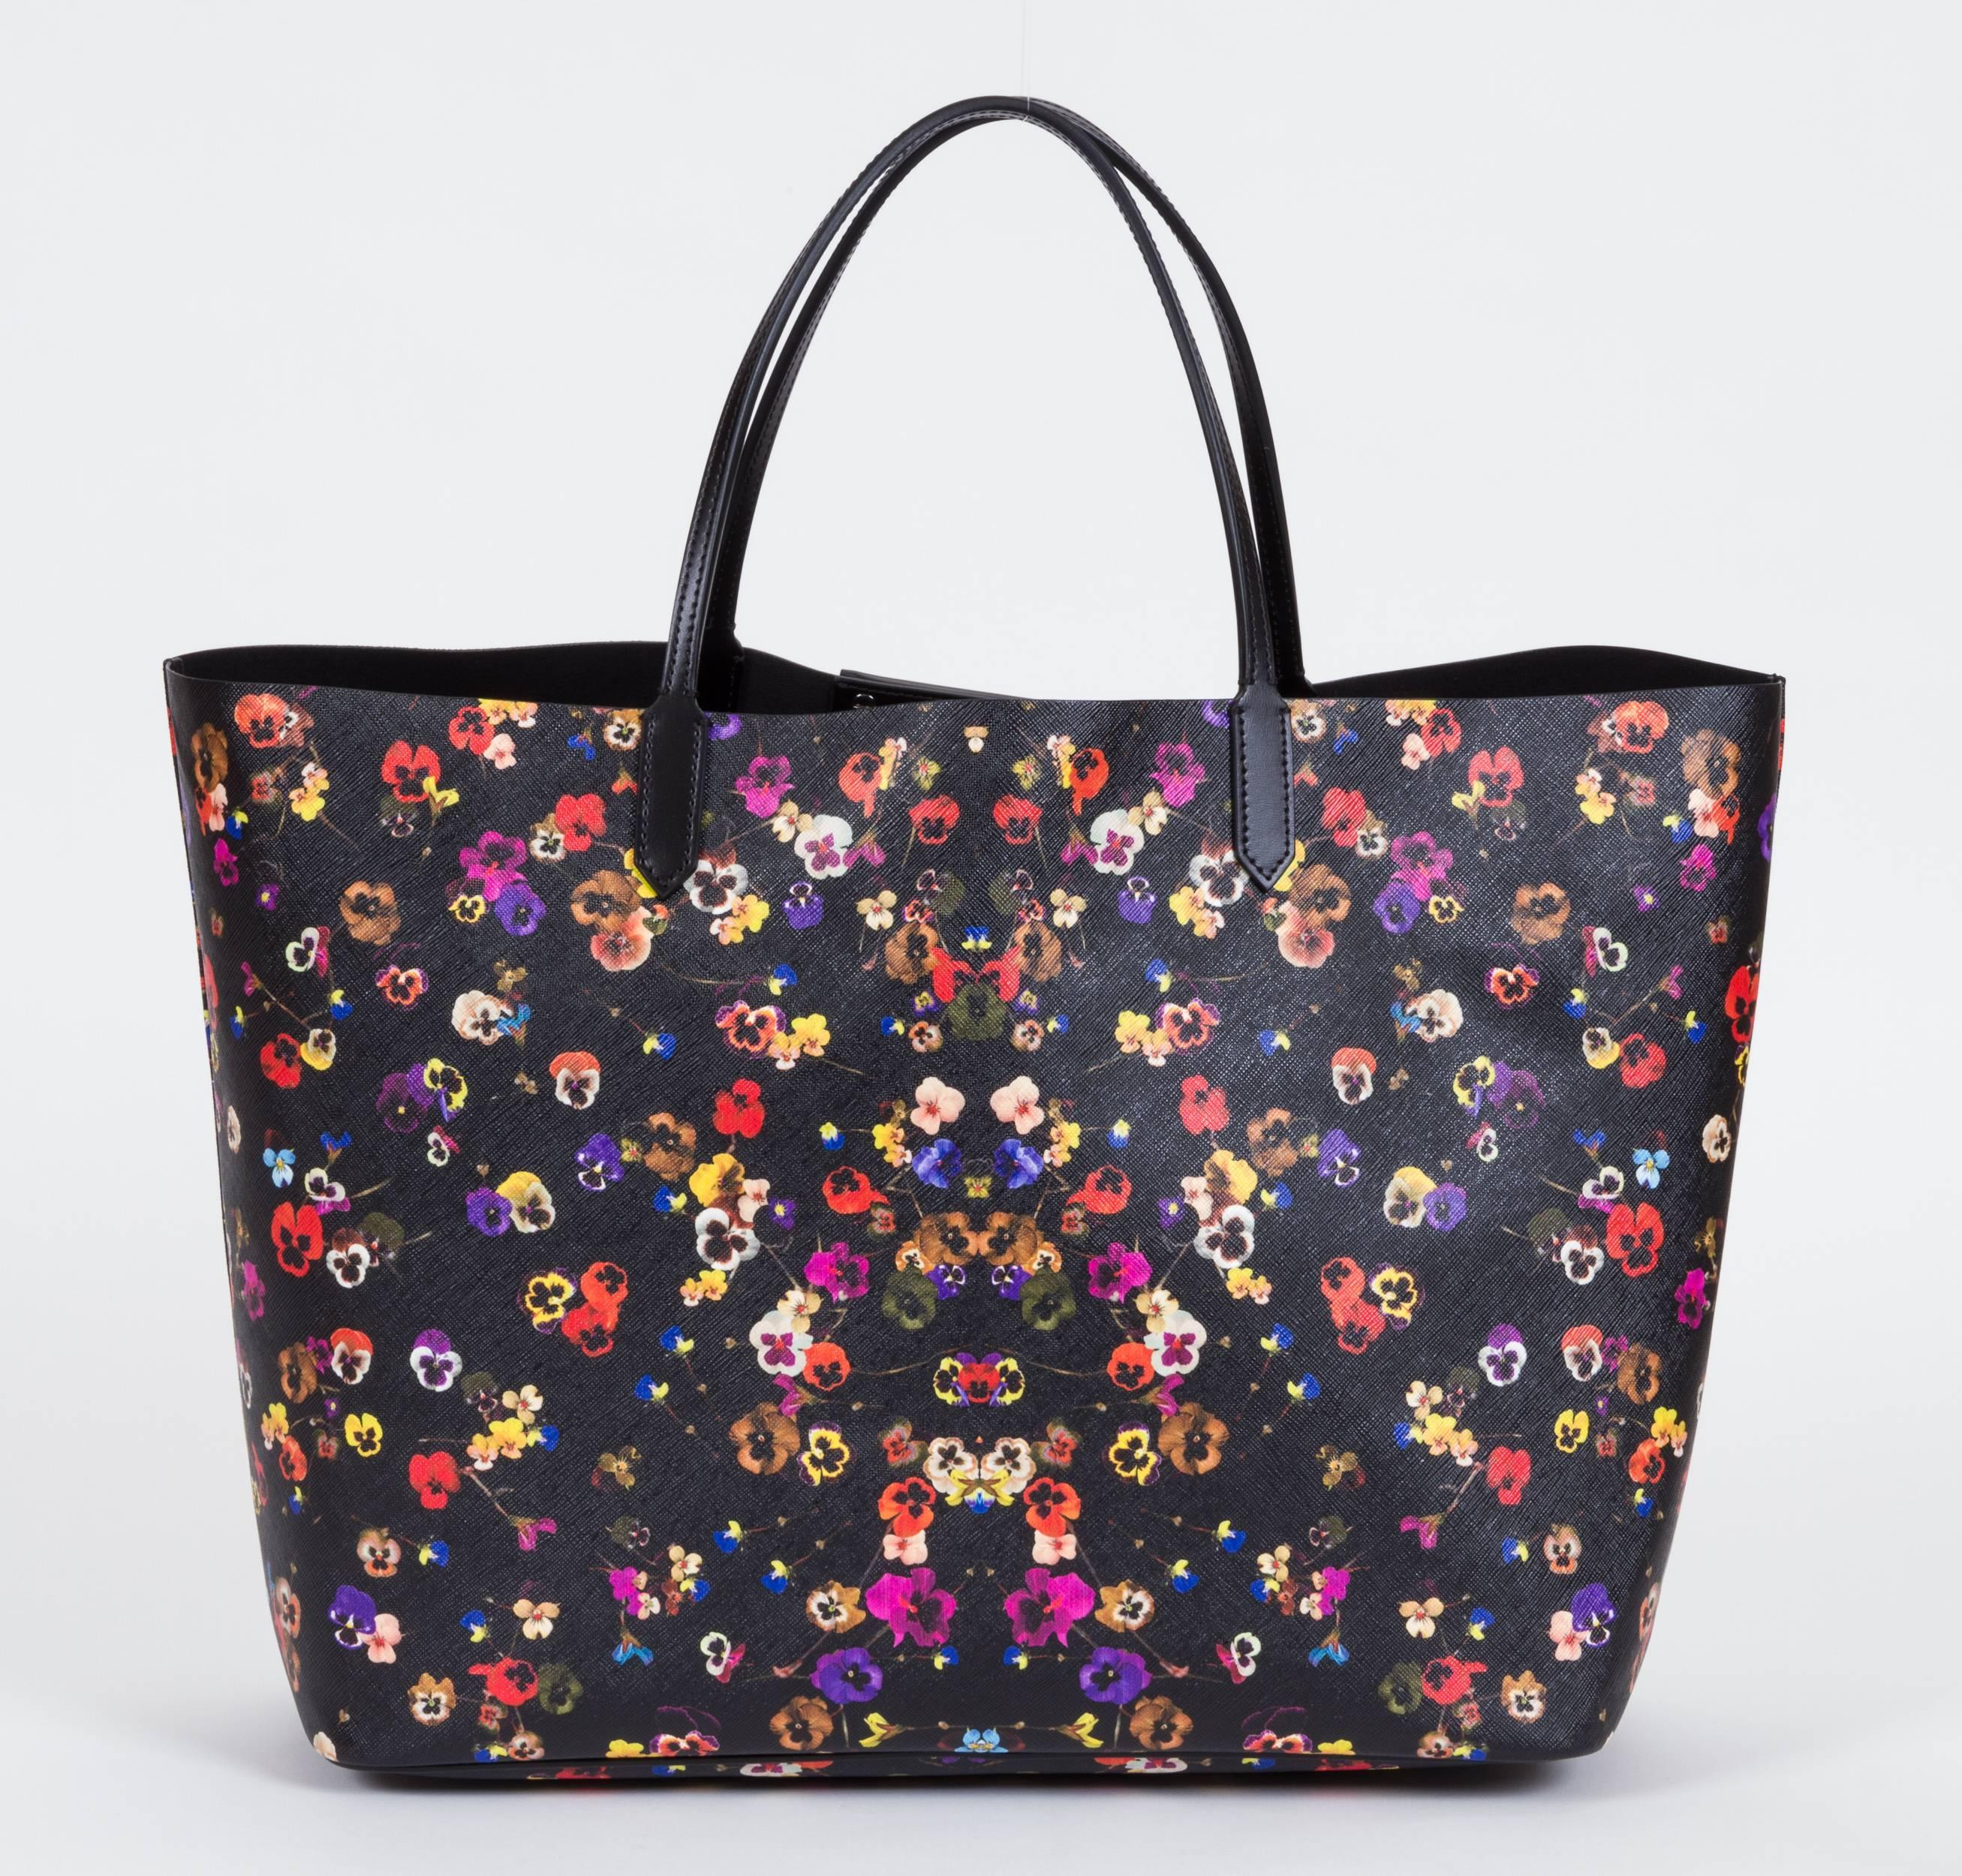 13b7bad042 New Givenchy Large Flower Antigona Shopper Tote Bag For Sale at 1stdibs